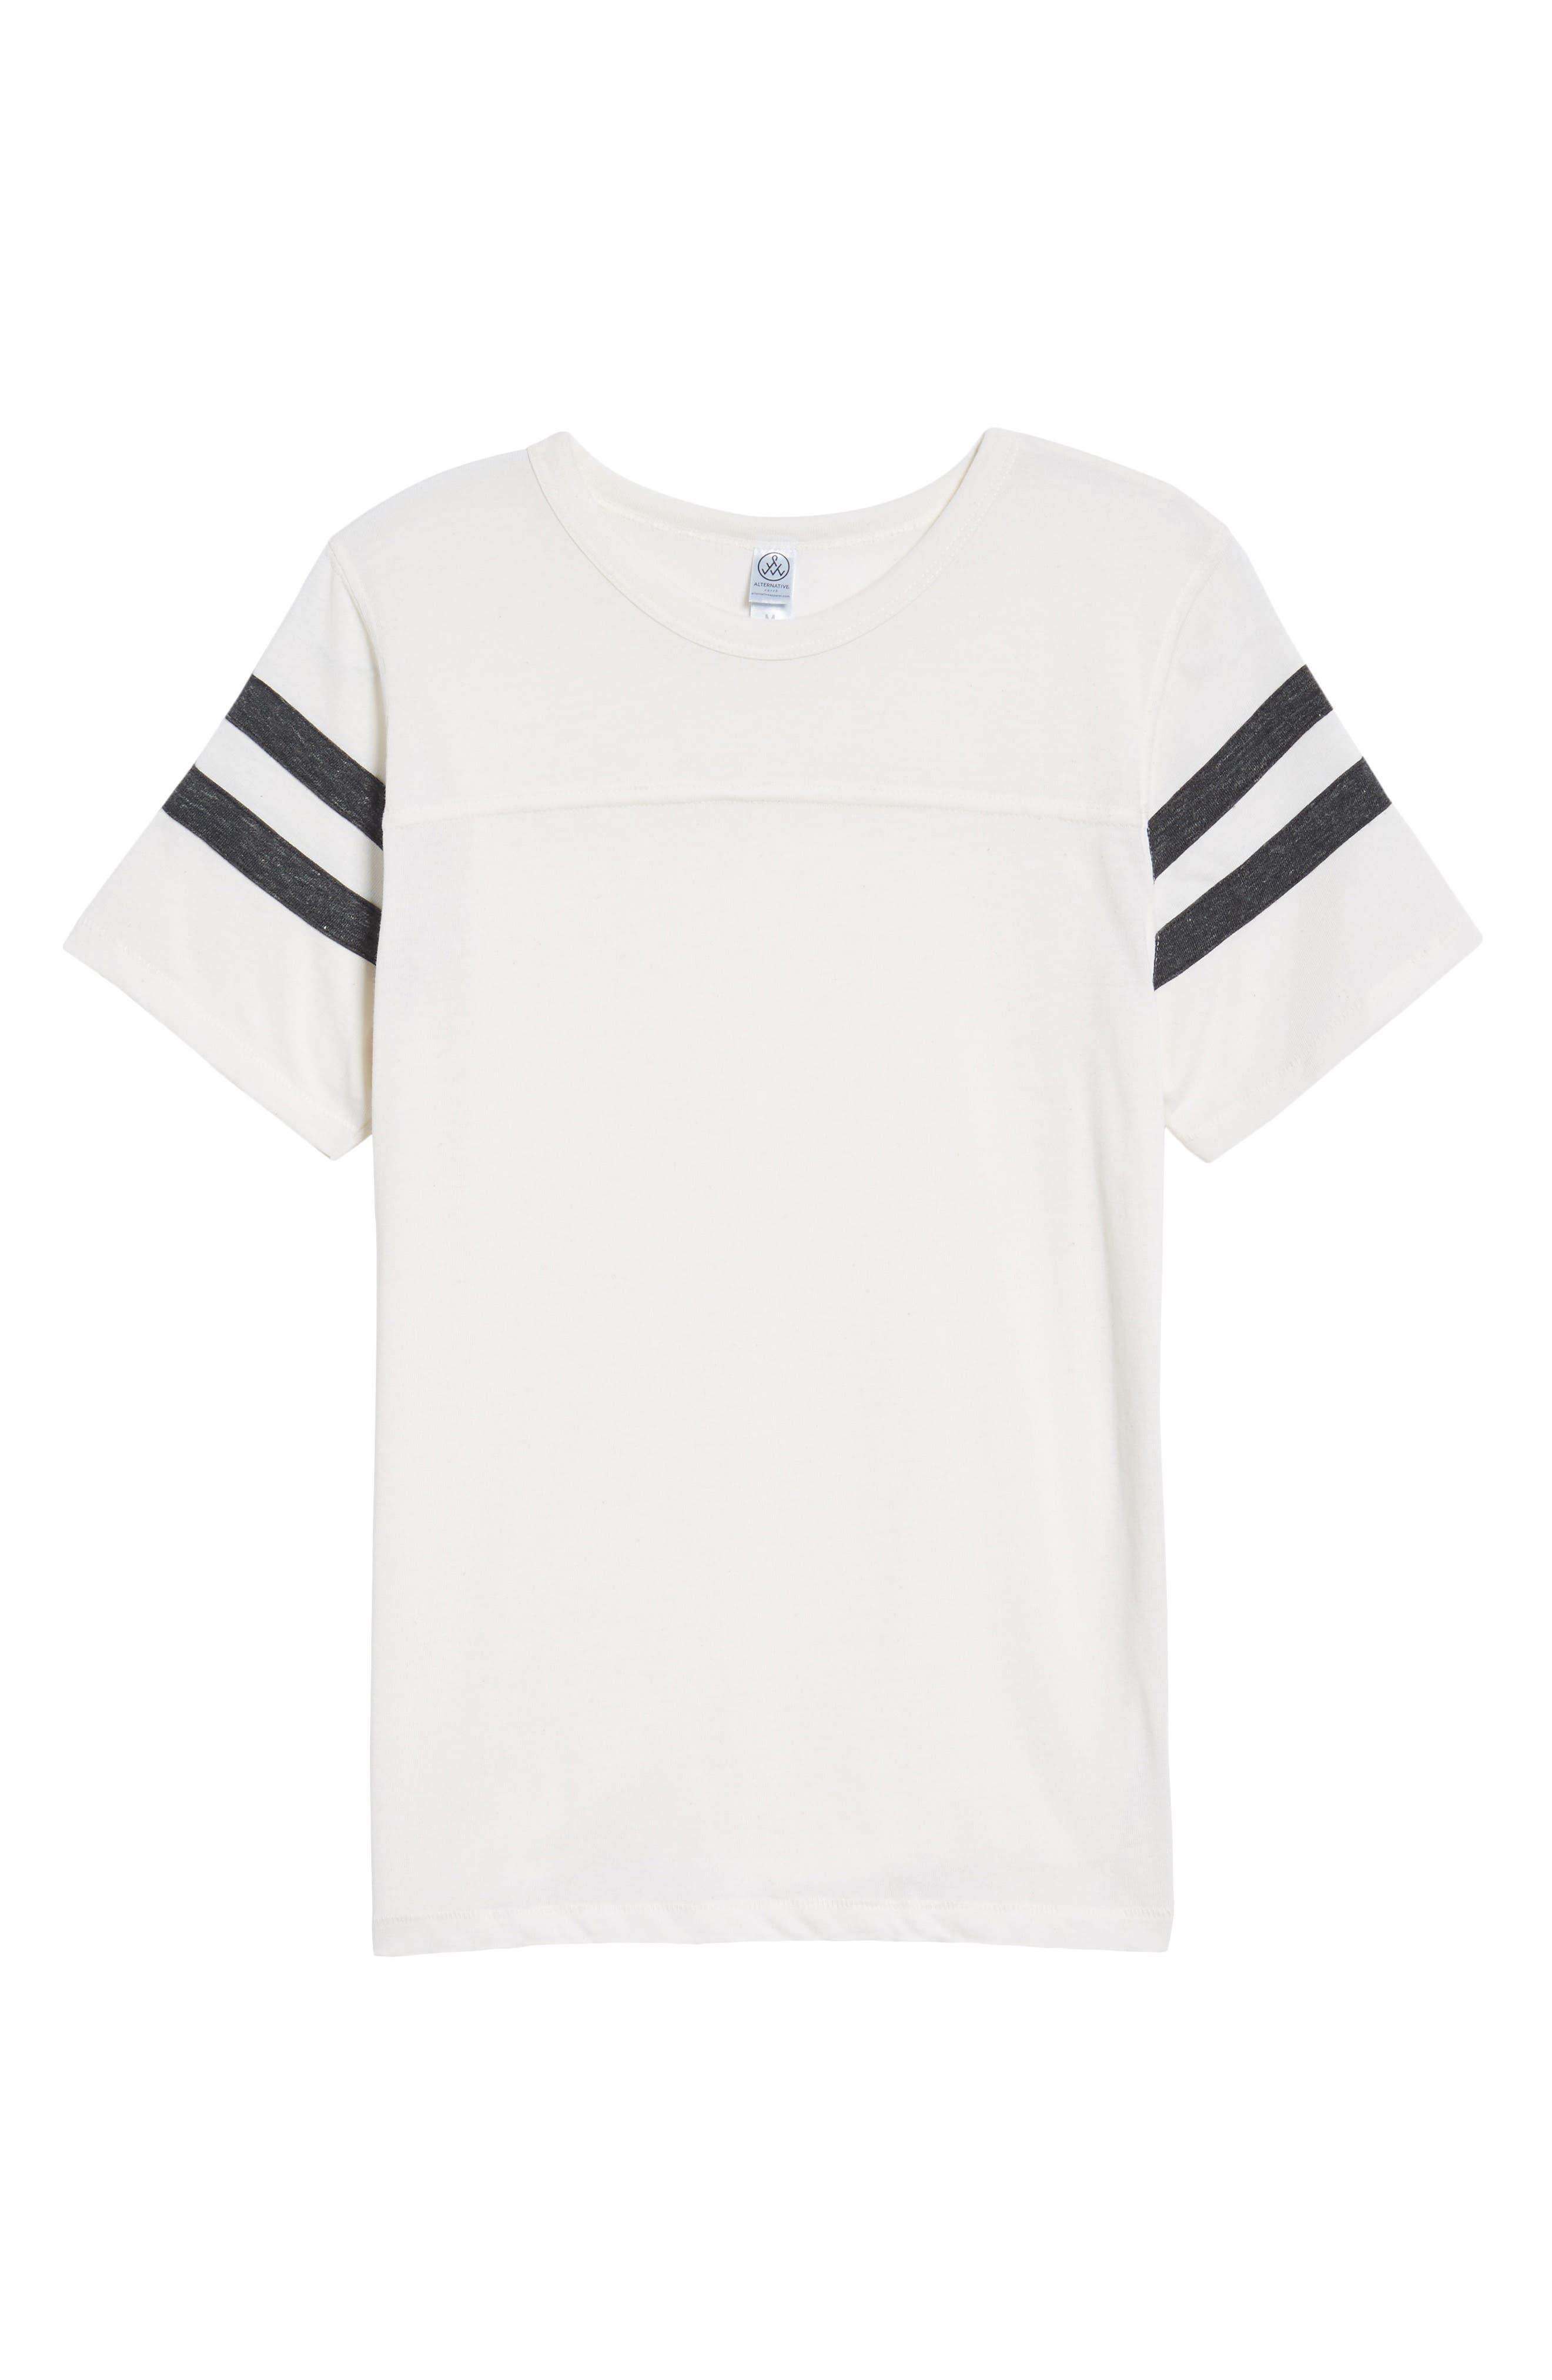 Football T-Shirt,                             Alternate thumbnail 18, color,